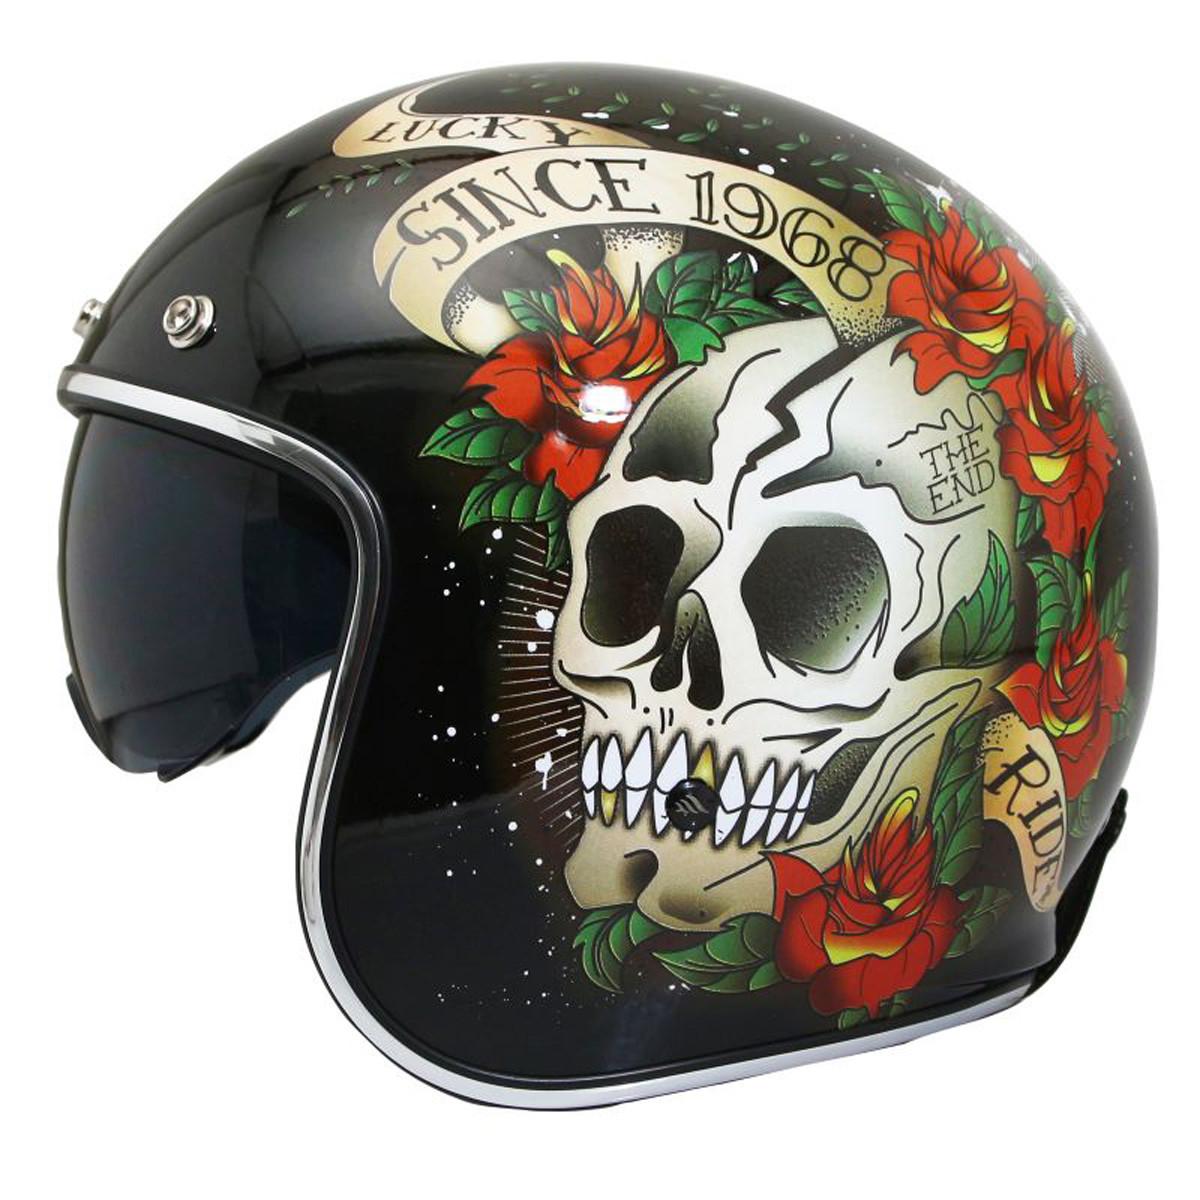 Casque Jet - MT Le Mans 2 SV Skull & Roses - Noir Brillant